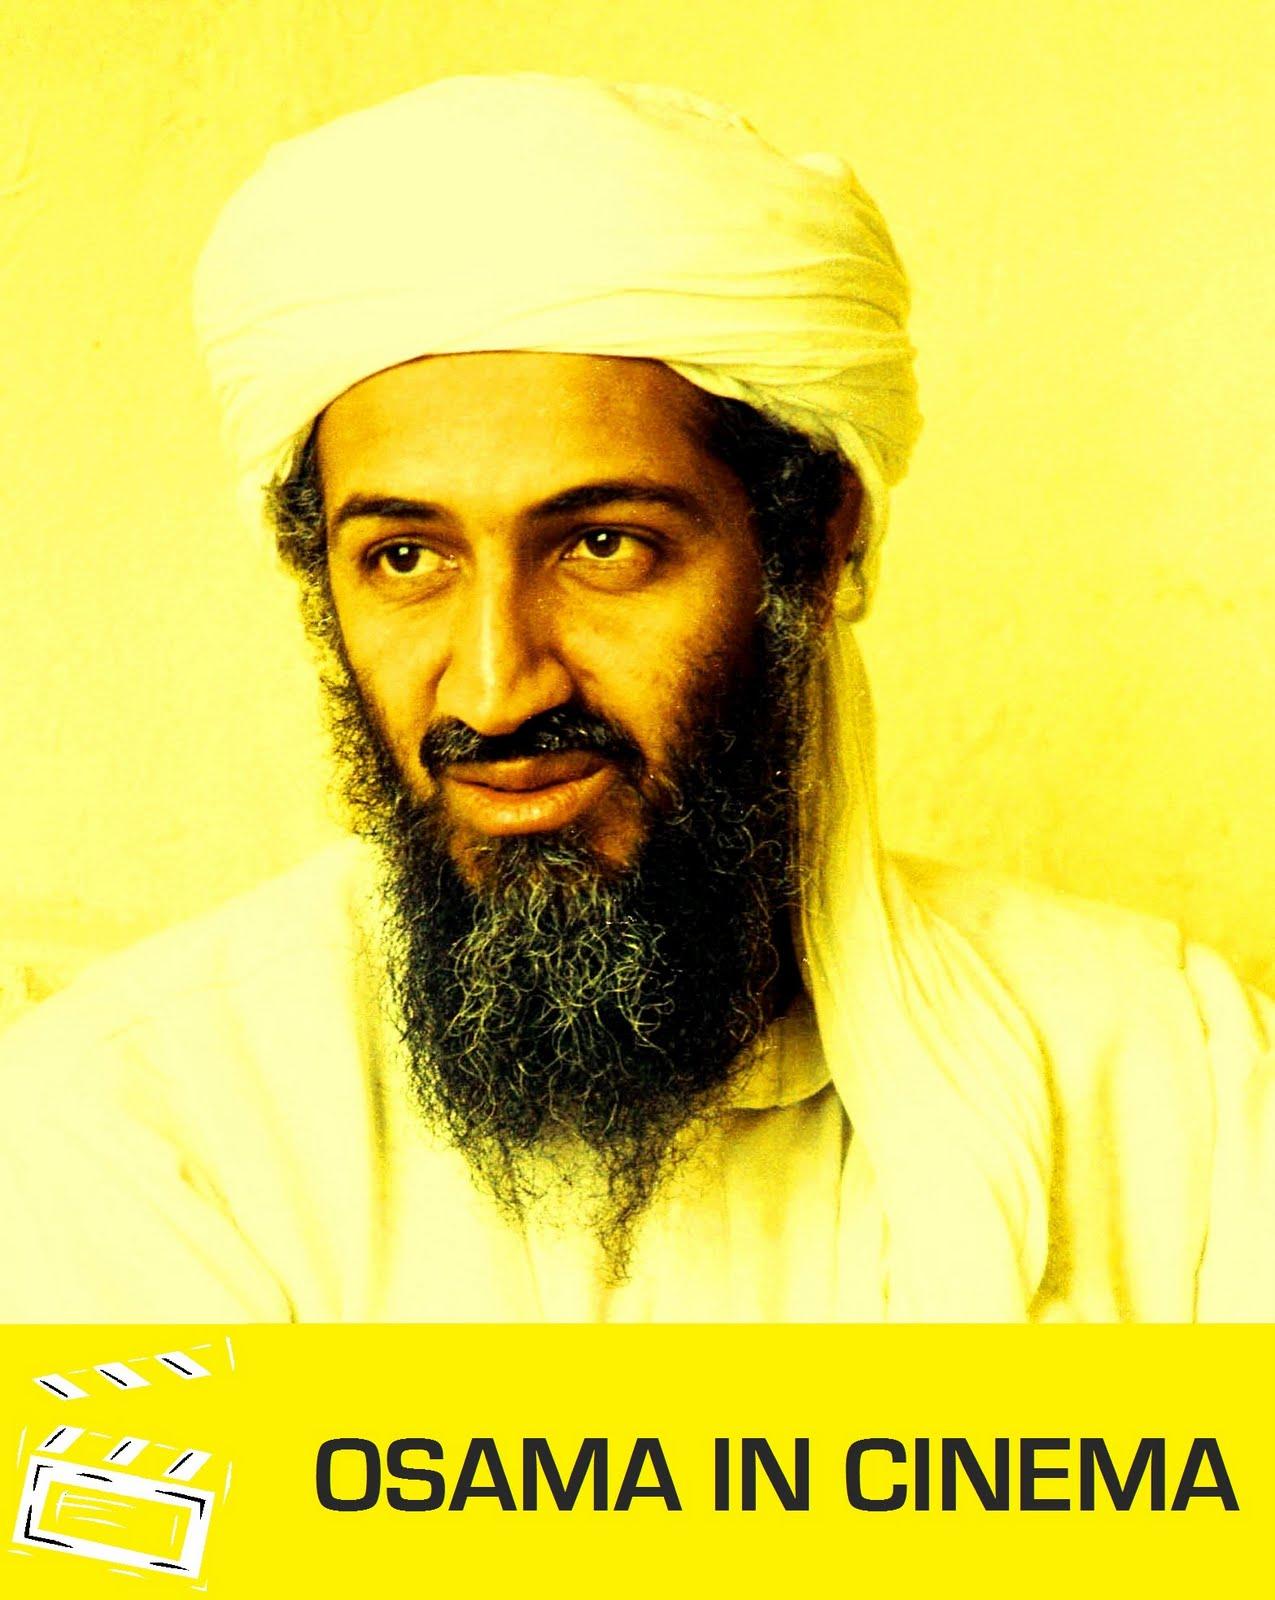 A biography of osama bin laden